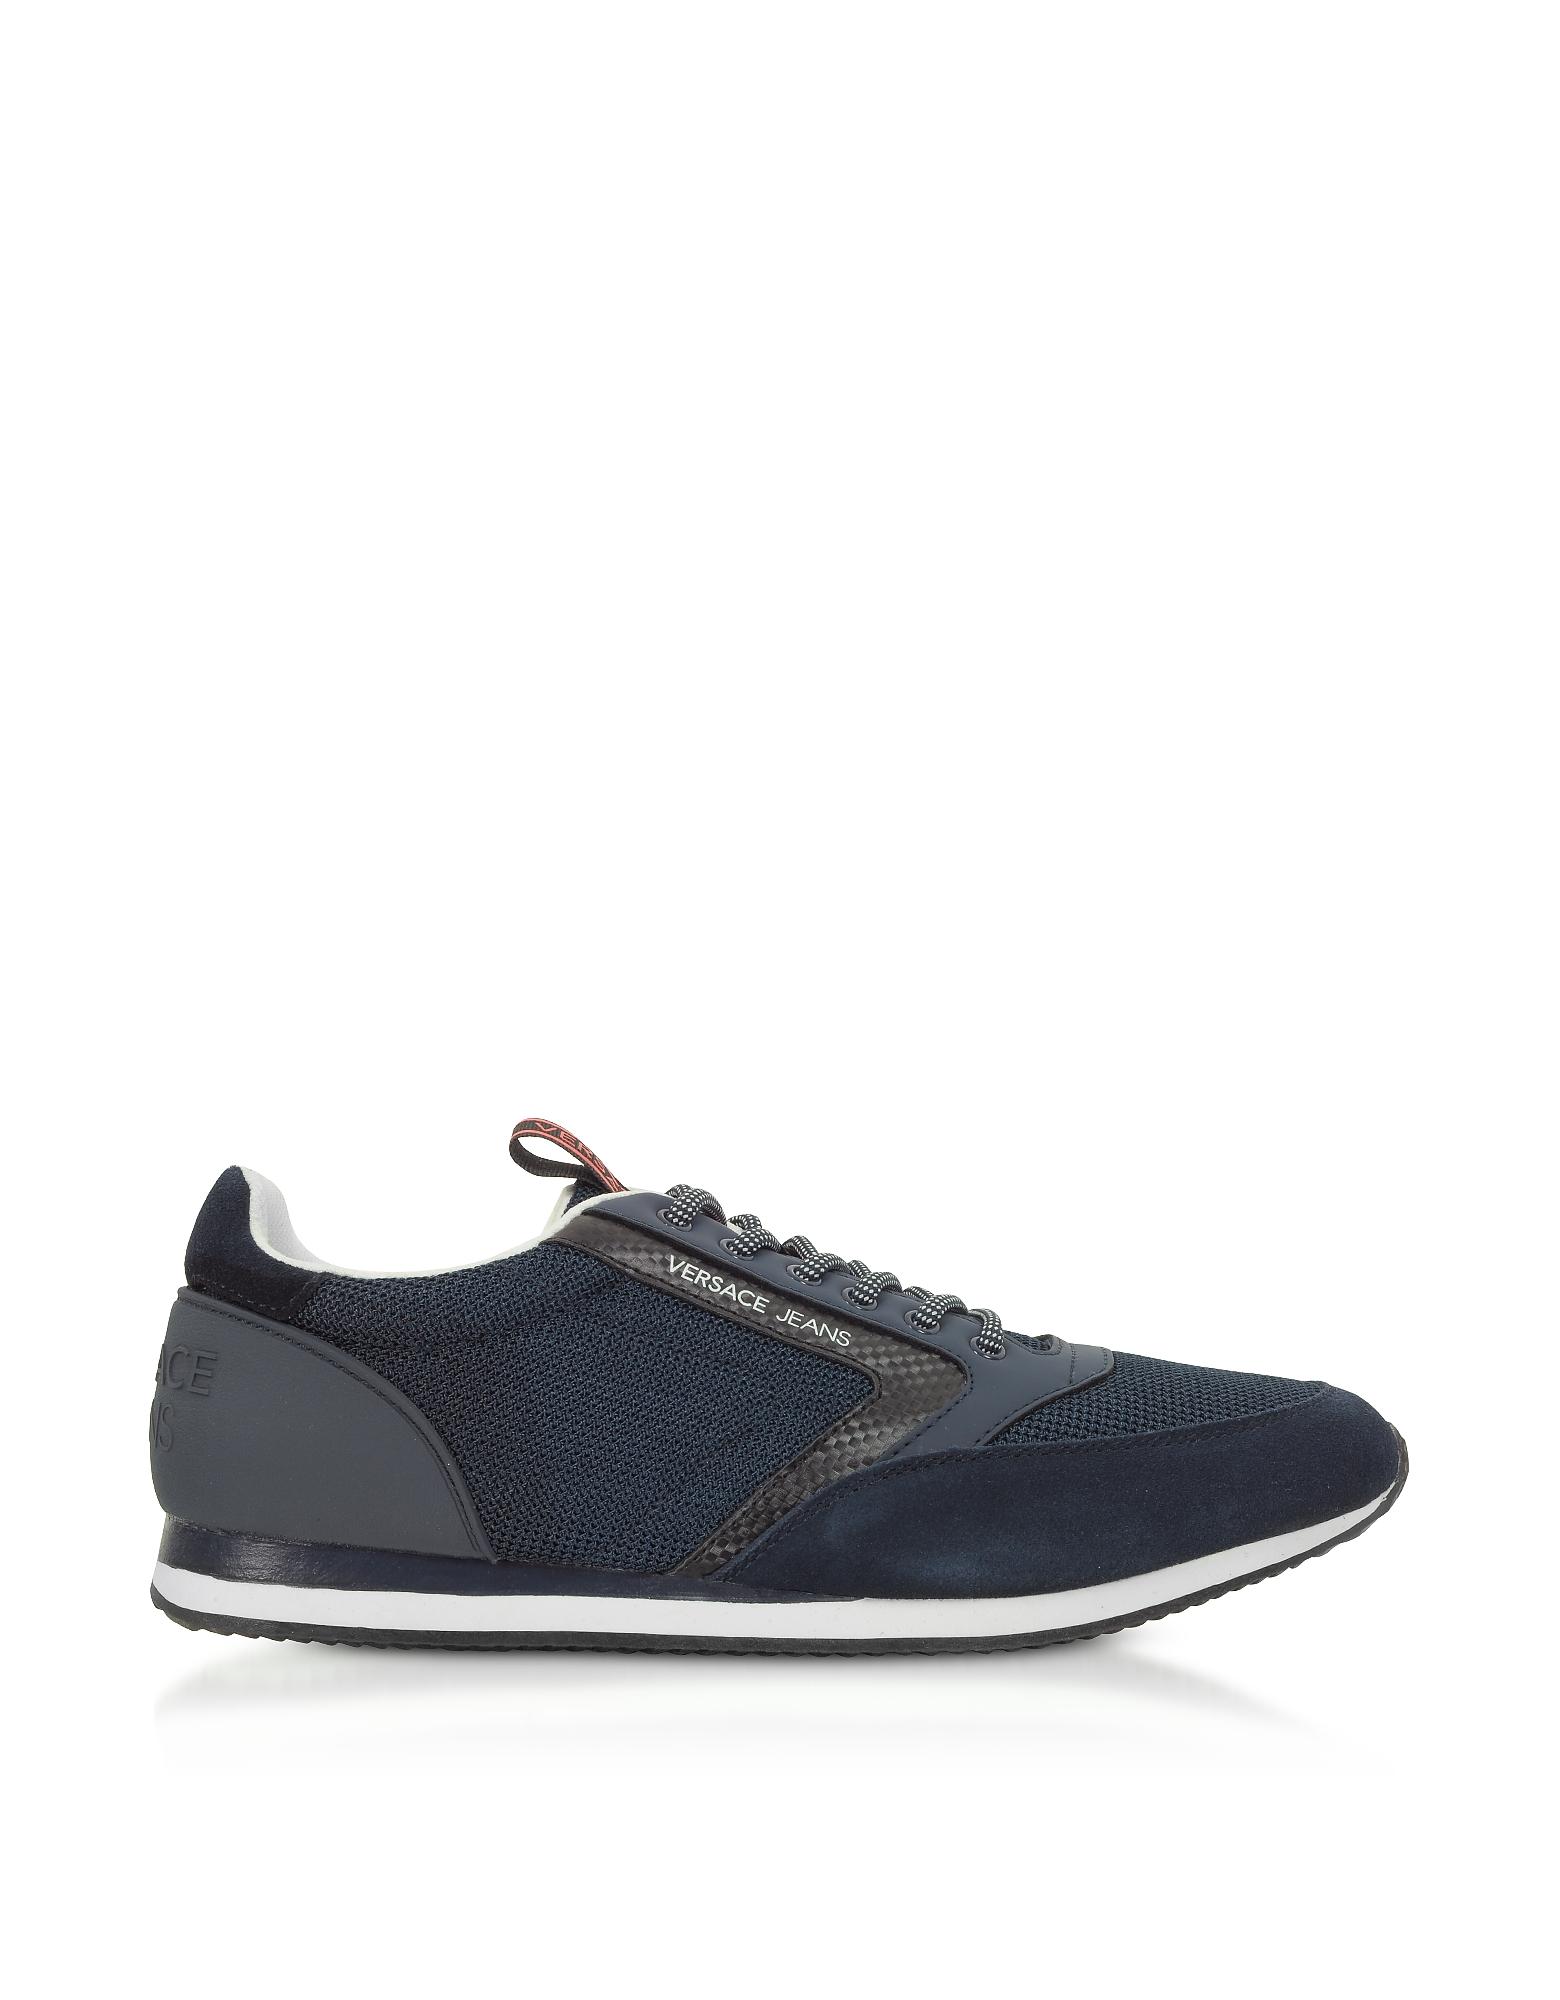 Versace Jeans Designer Shoes, New Running Navy Blue Mesh & Suede Men's Sneakers